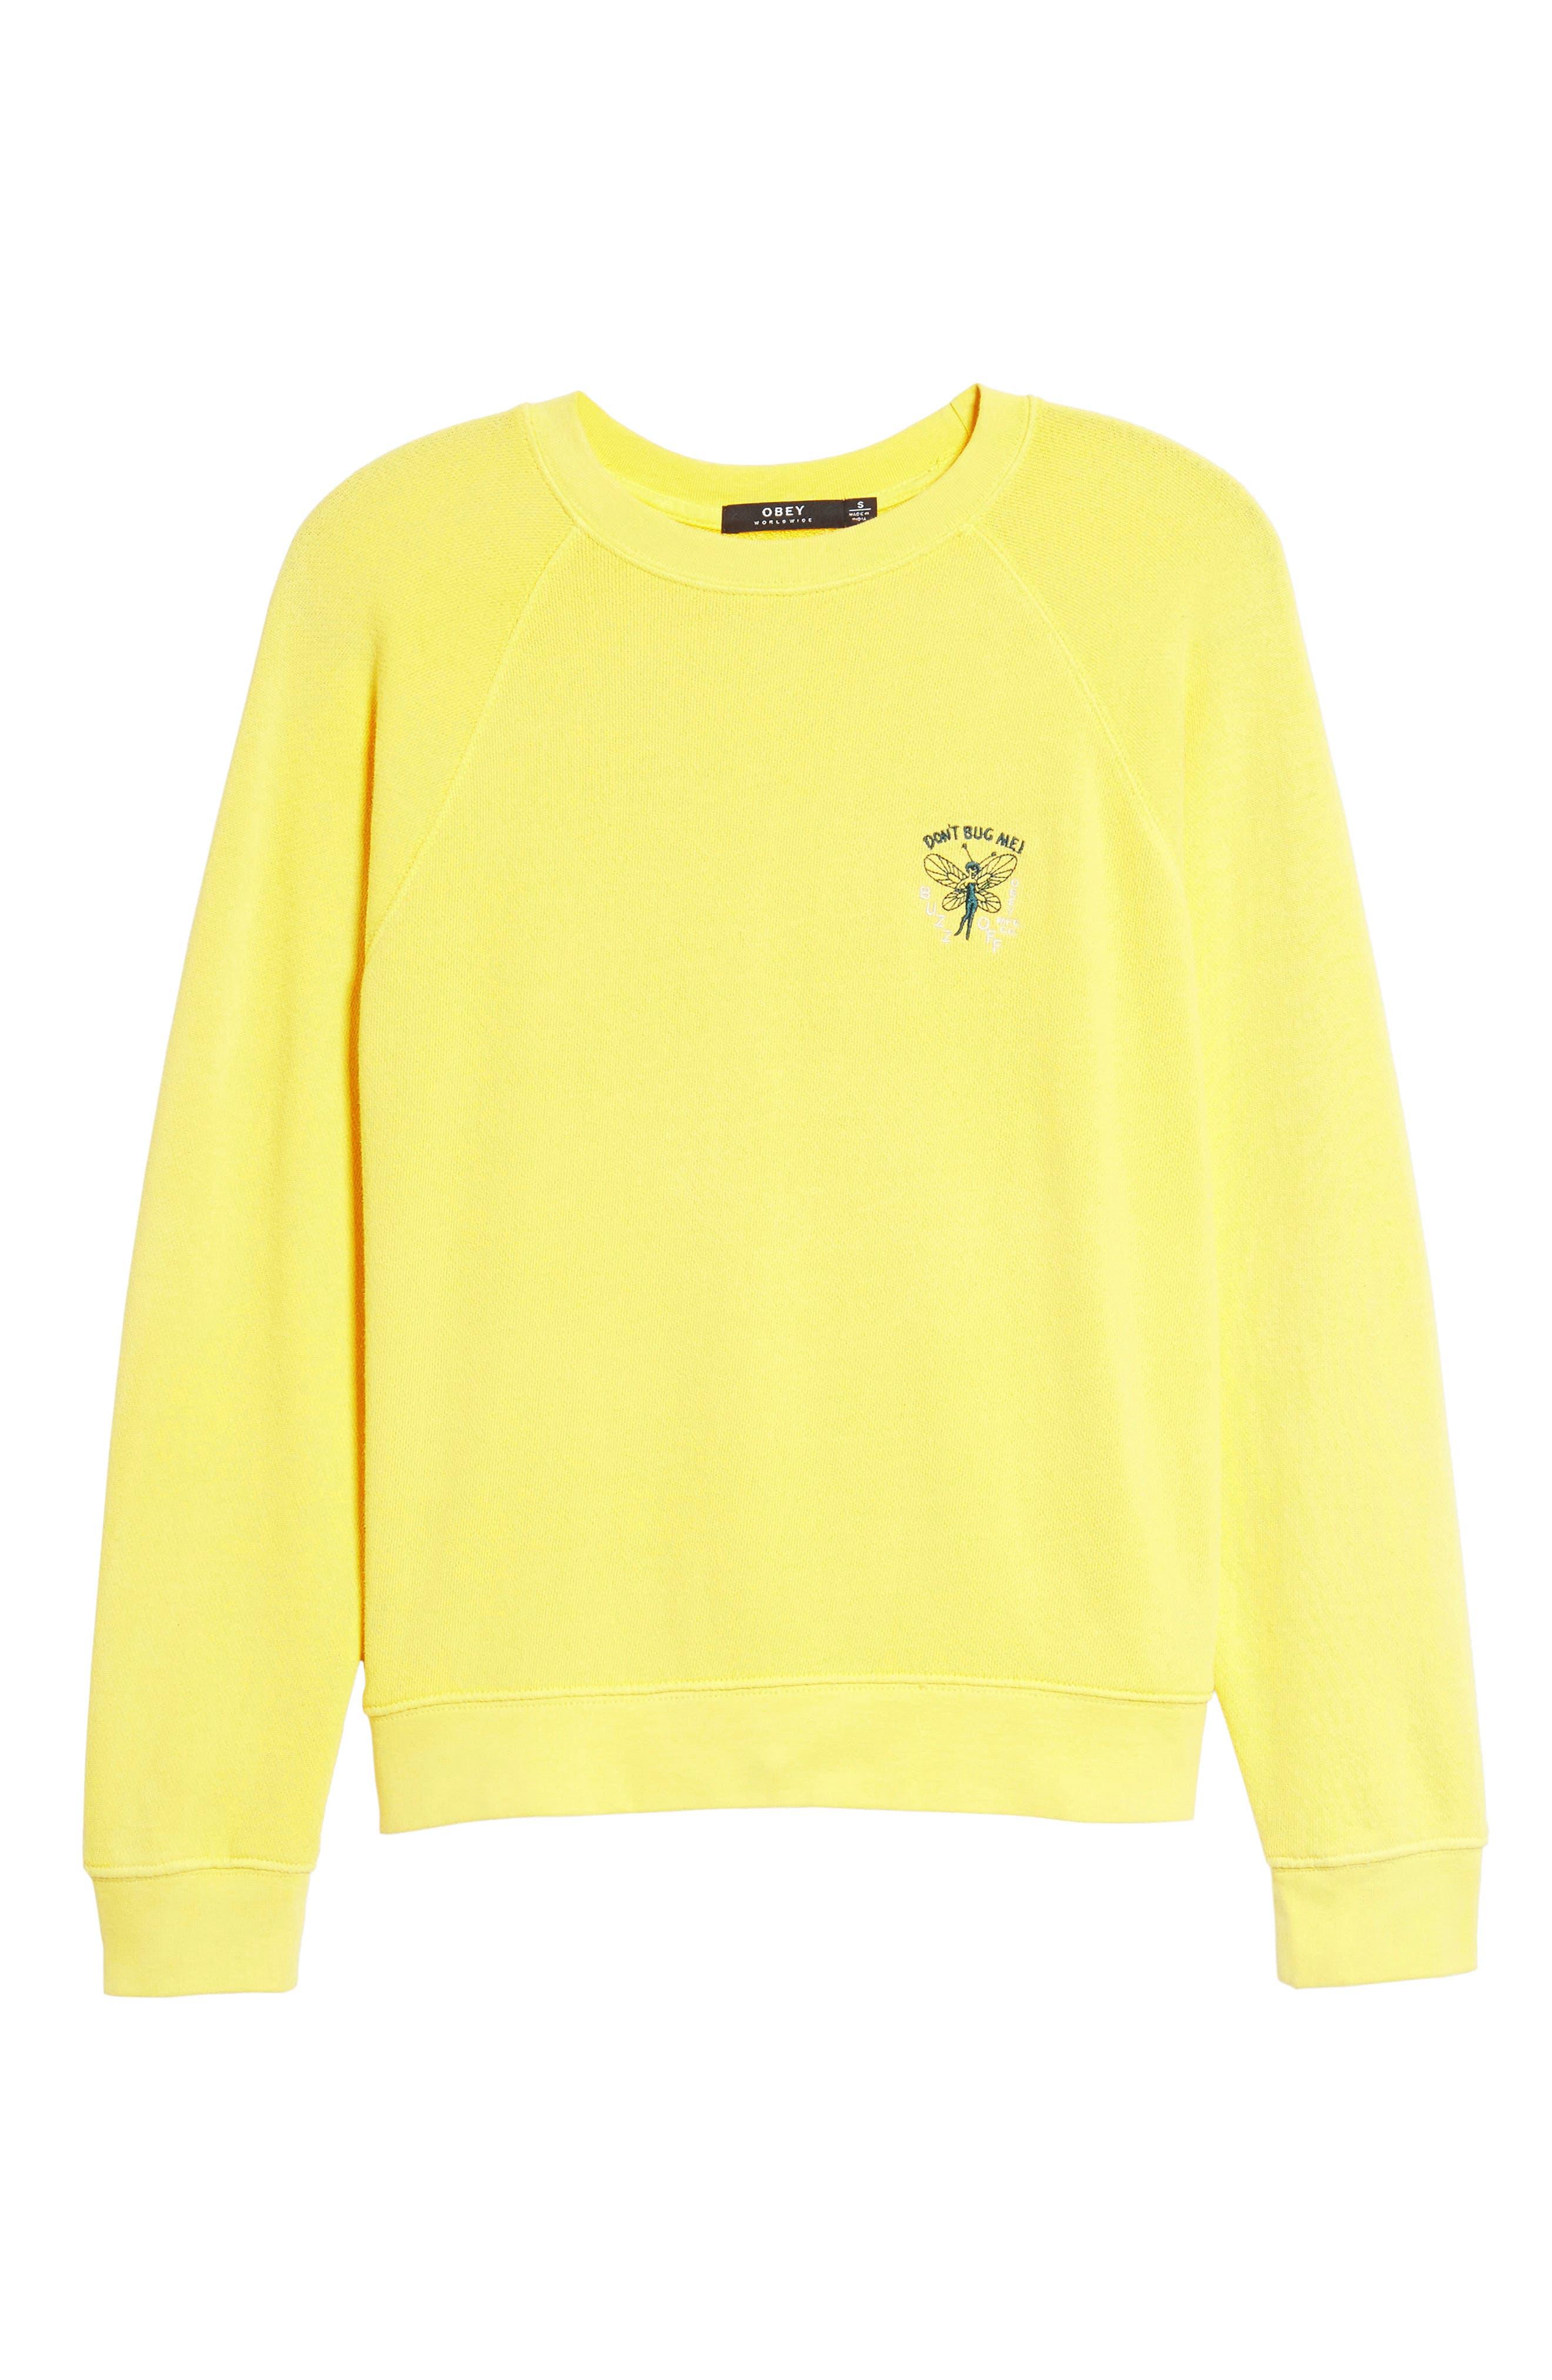 Portola Crew Sweatshirt,                             Alternate thumbnail 6, color,                             750